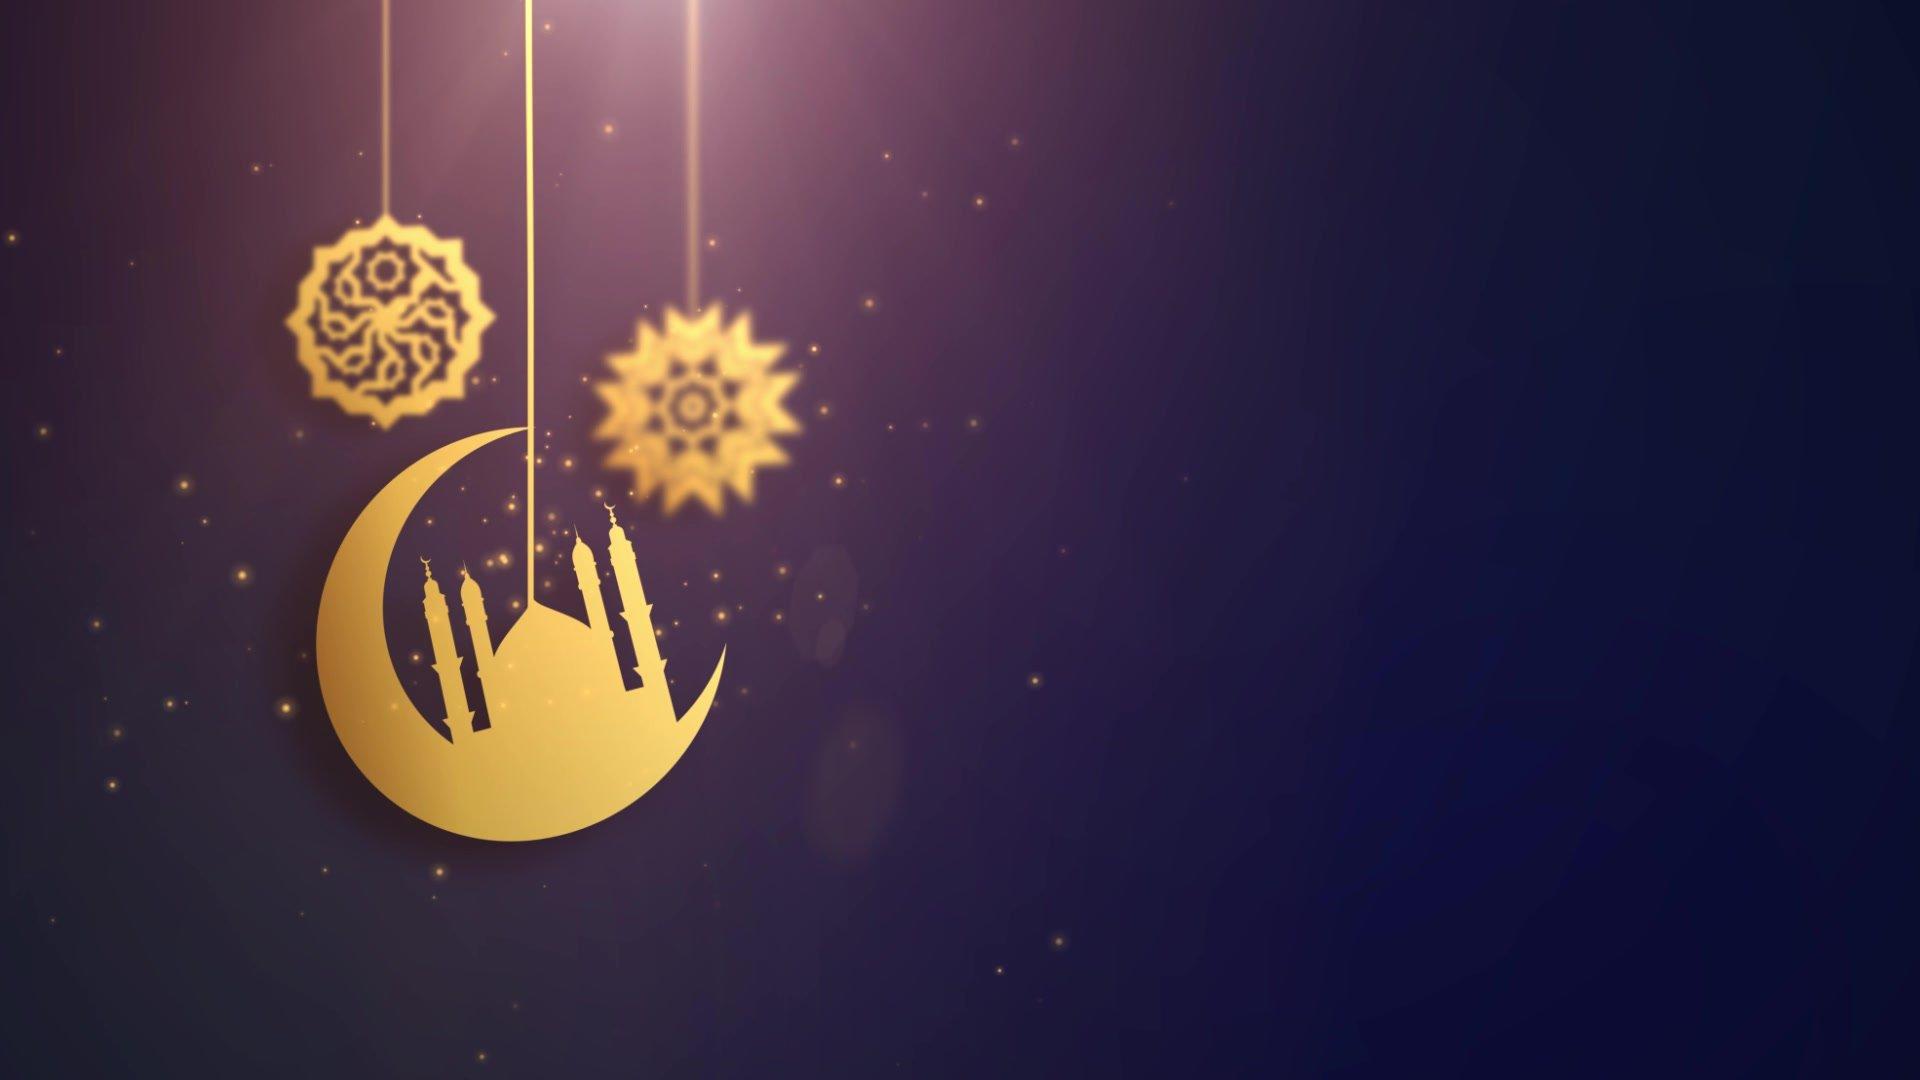 Ramadan Ramazan Eid Mubarak Arabic Symbols Falling Down On String Blue Background Free Hd Video Clips Stock Video Footage At Videezy